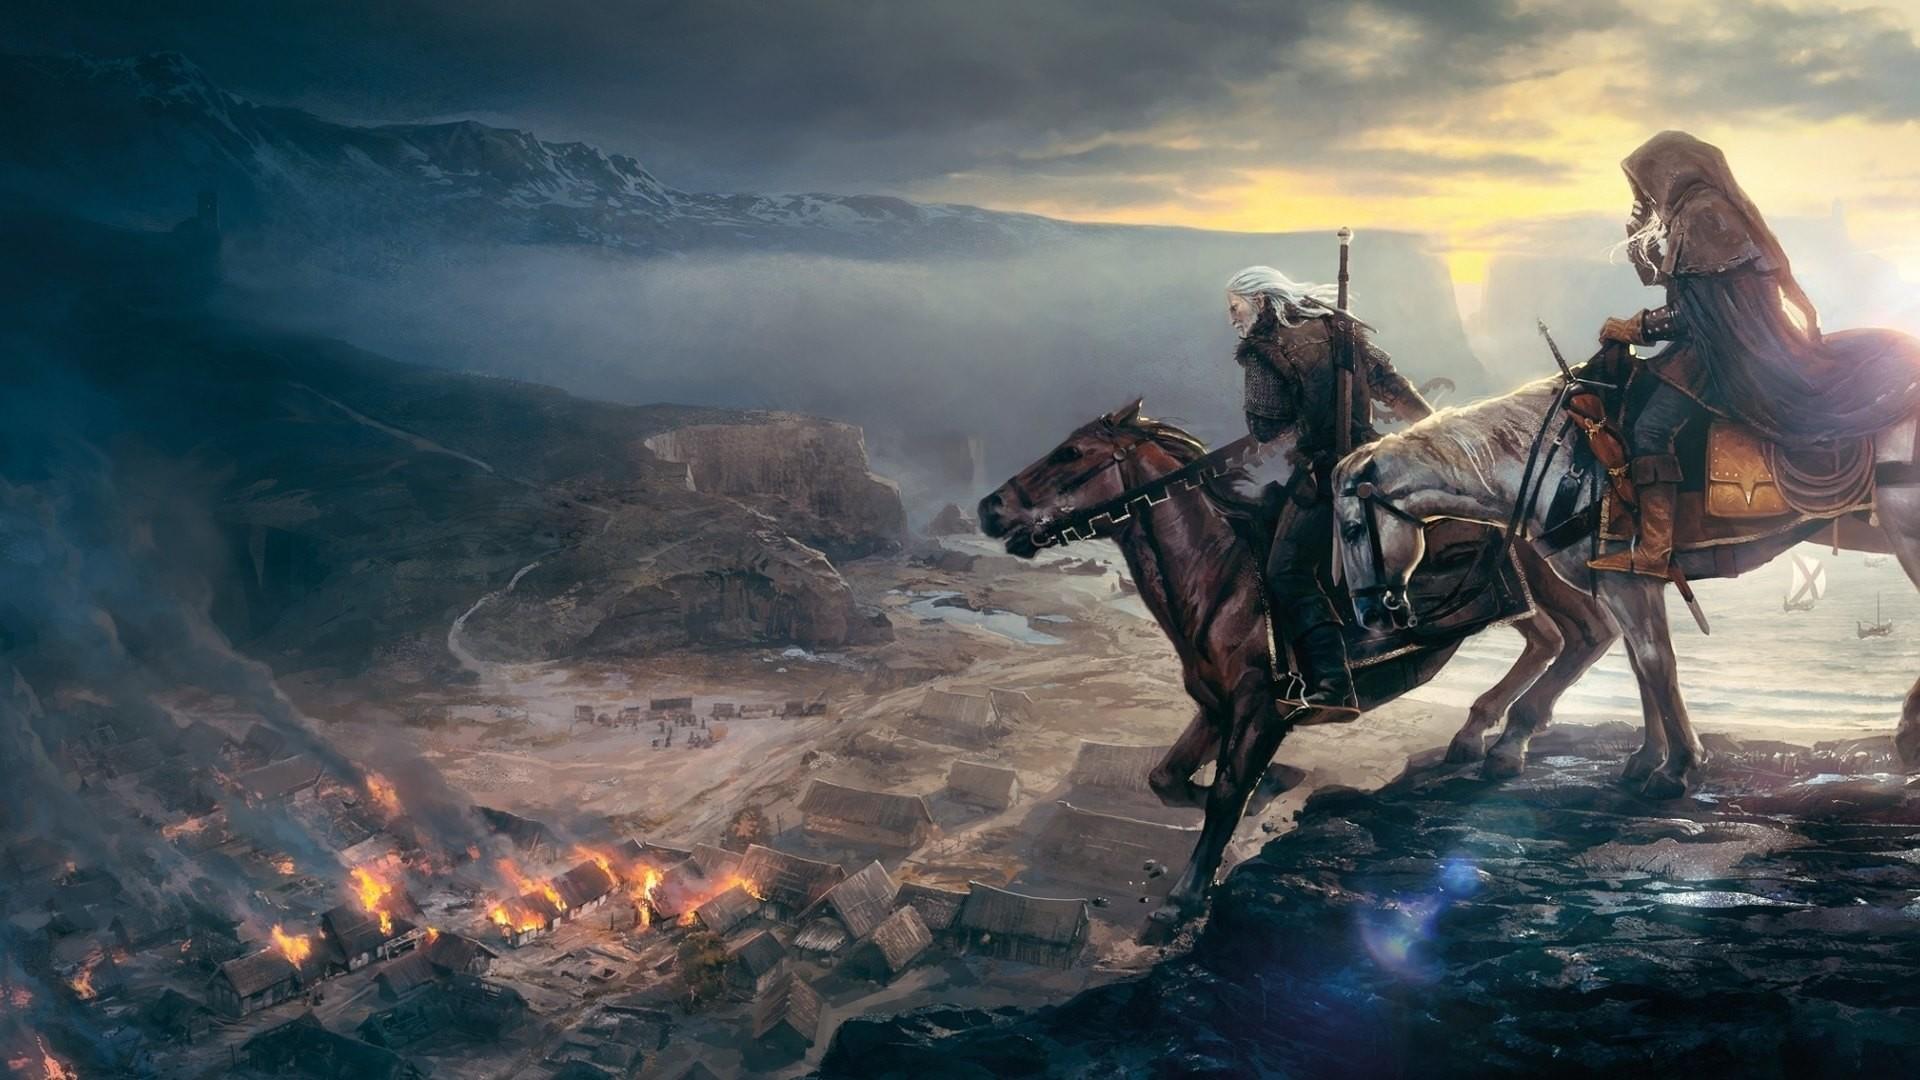 Fan Art by The Witcher 3: Wild Hunt Wallpaper · HD Wallpapers